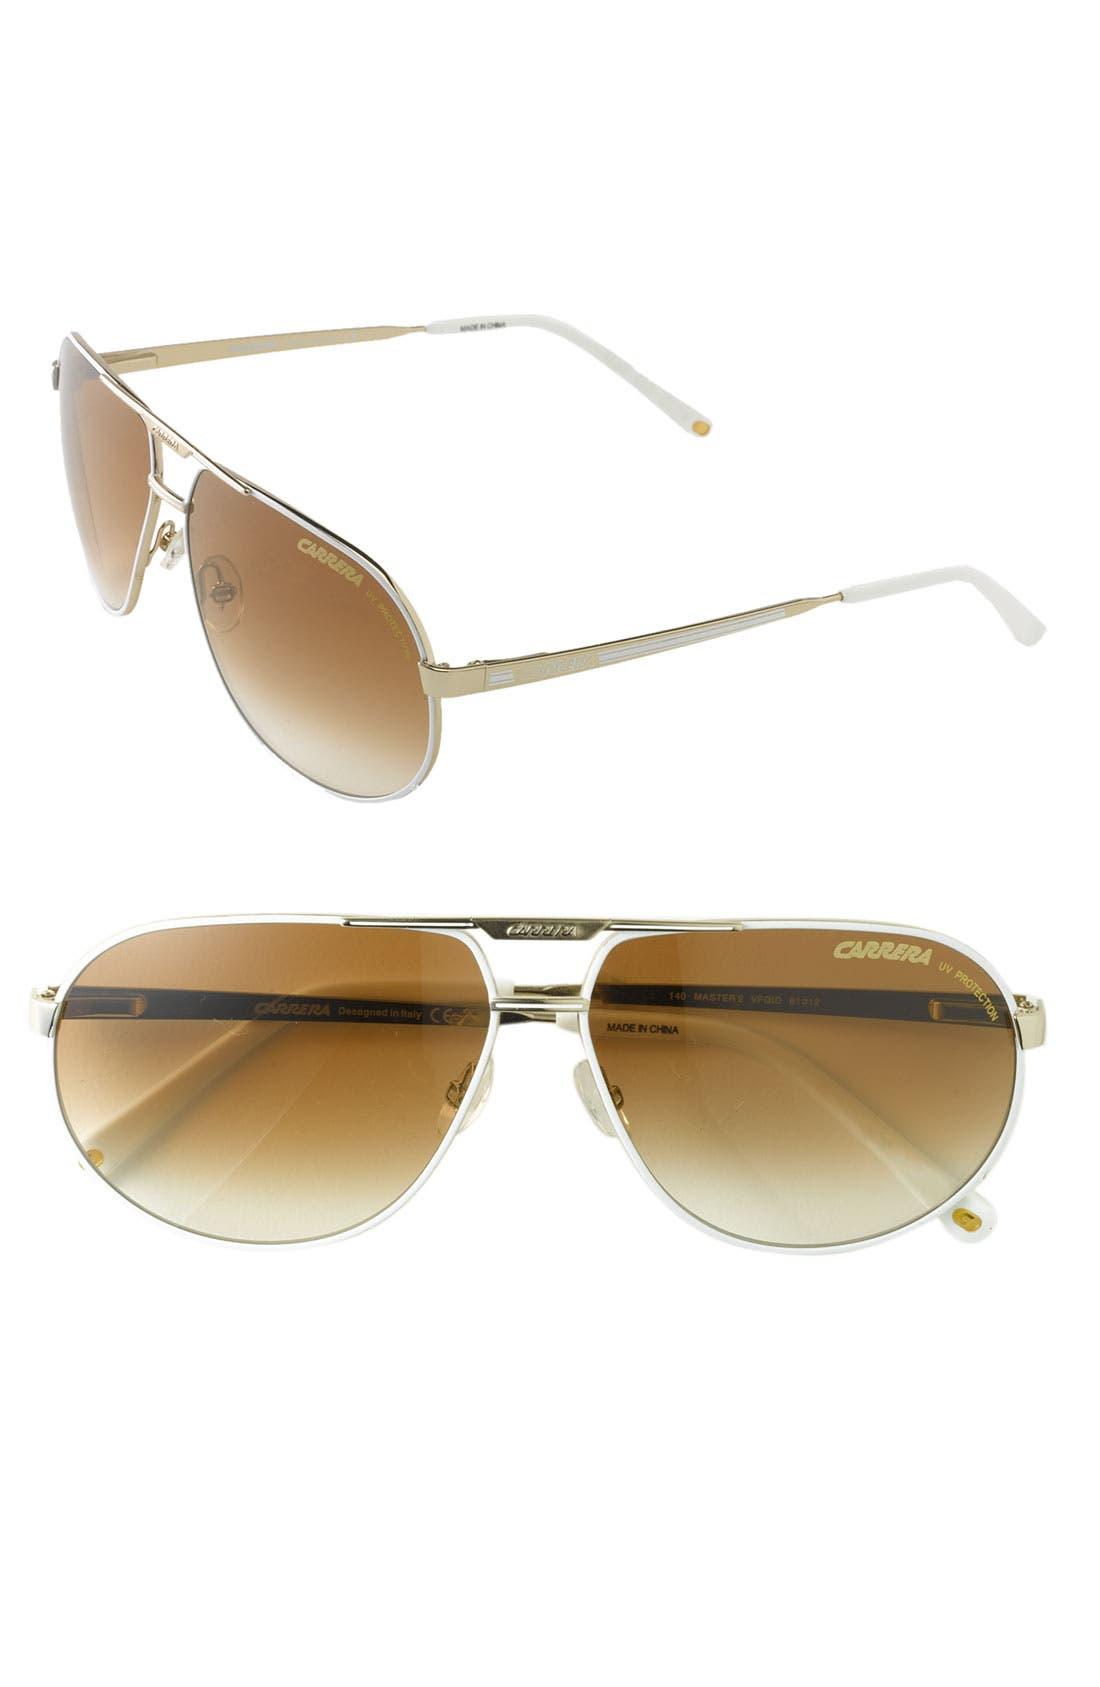 Main Image - Carrera Eyewear 'Master 2' 61mm Classic Metal Aviator Sunglasses